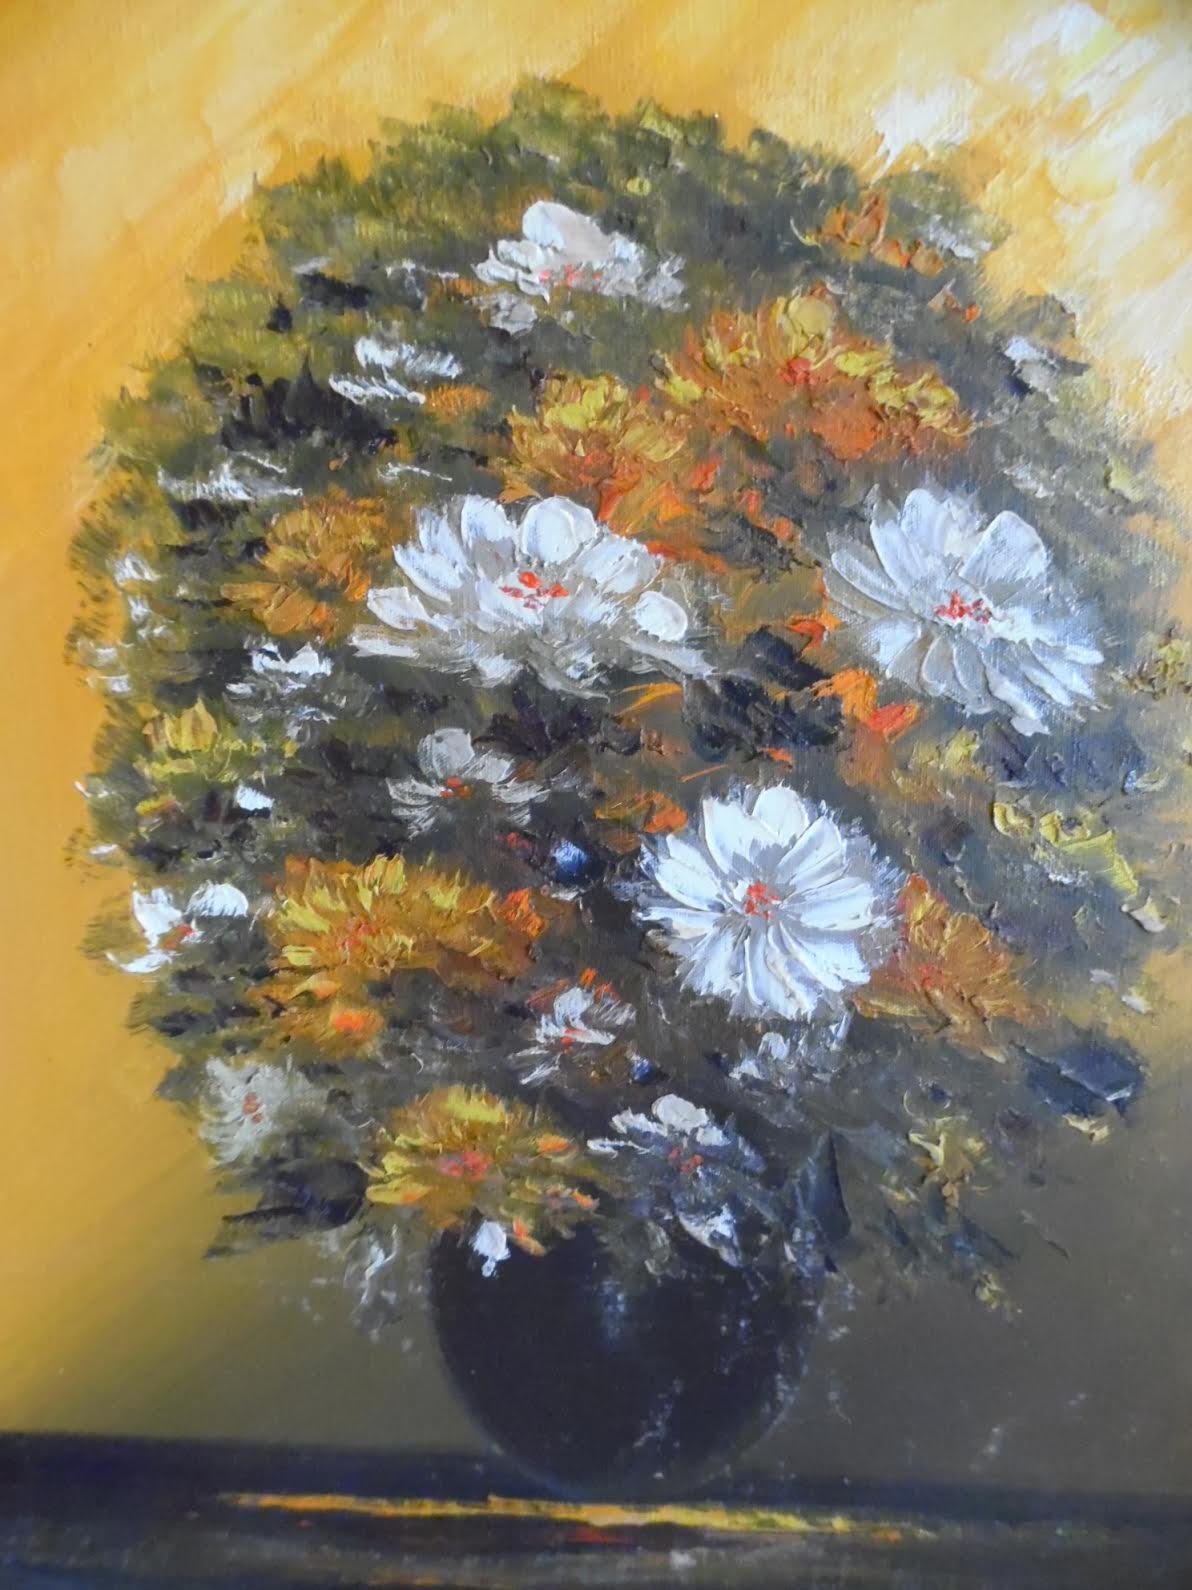 Flowers painting by  Audrey Bernice Graydon Waugh